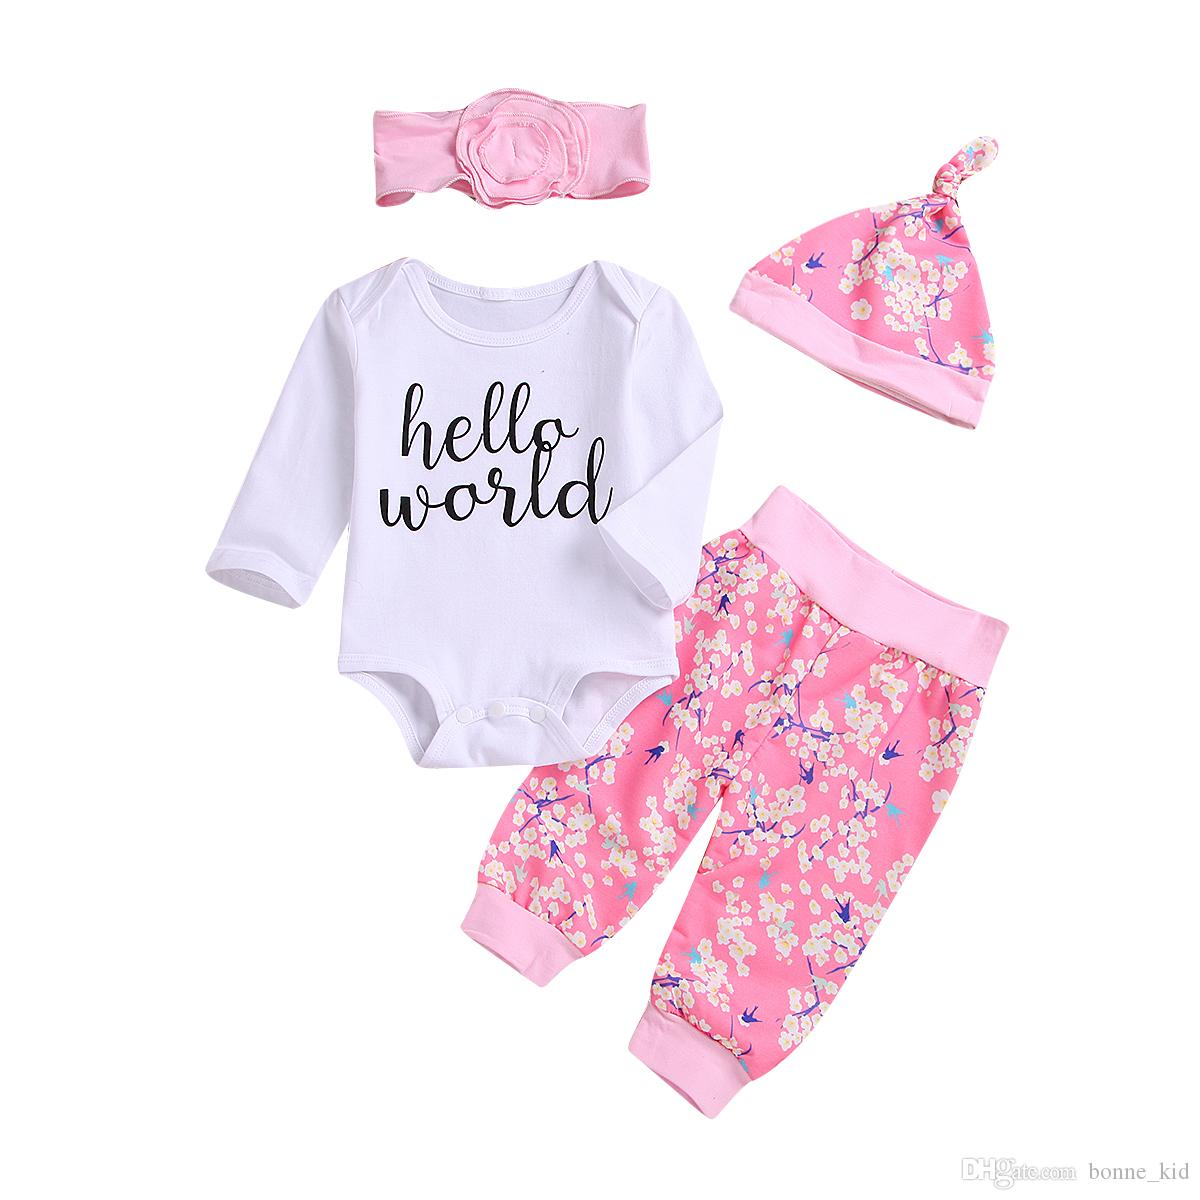 Boutique Infant Baby Girl Long Sleeve Bodysuit Romper Floral Pants Outfits Set